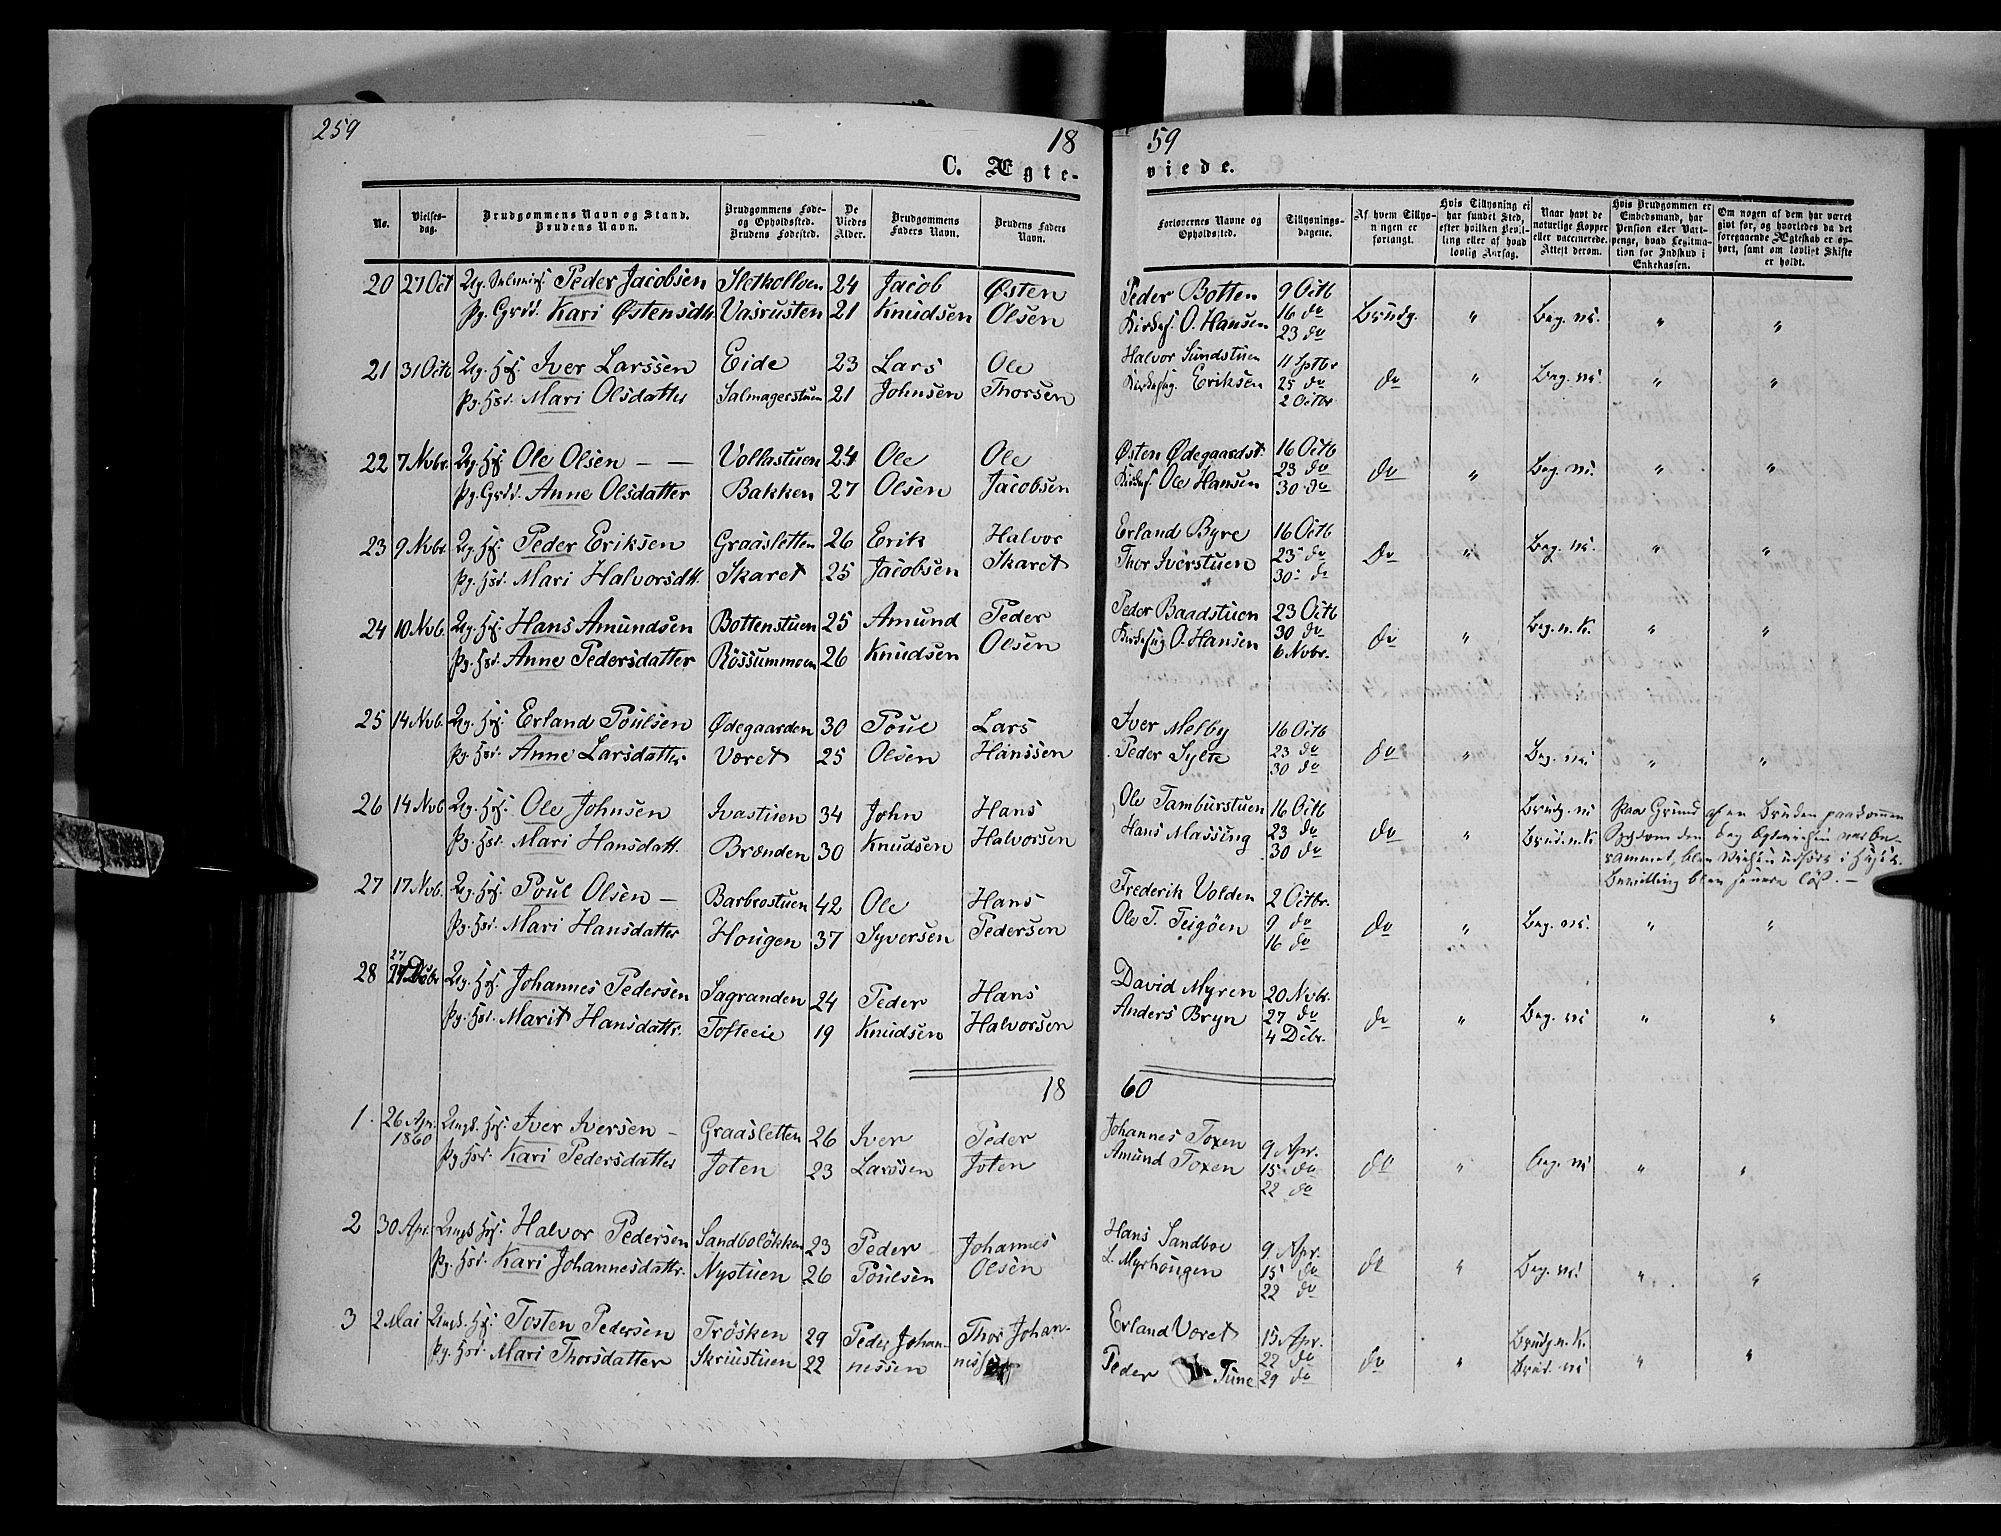 SAH, Nord-Fron prestekontor, Ministerialbok nr. 1, 1851-1864, s. 259